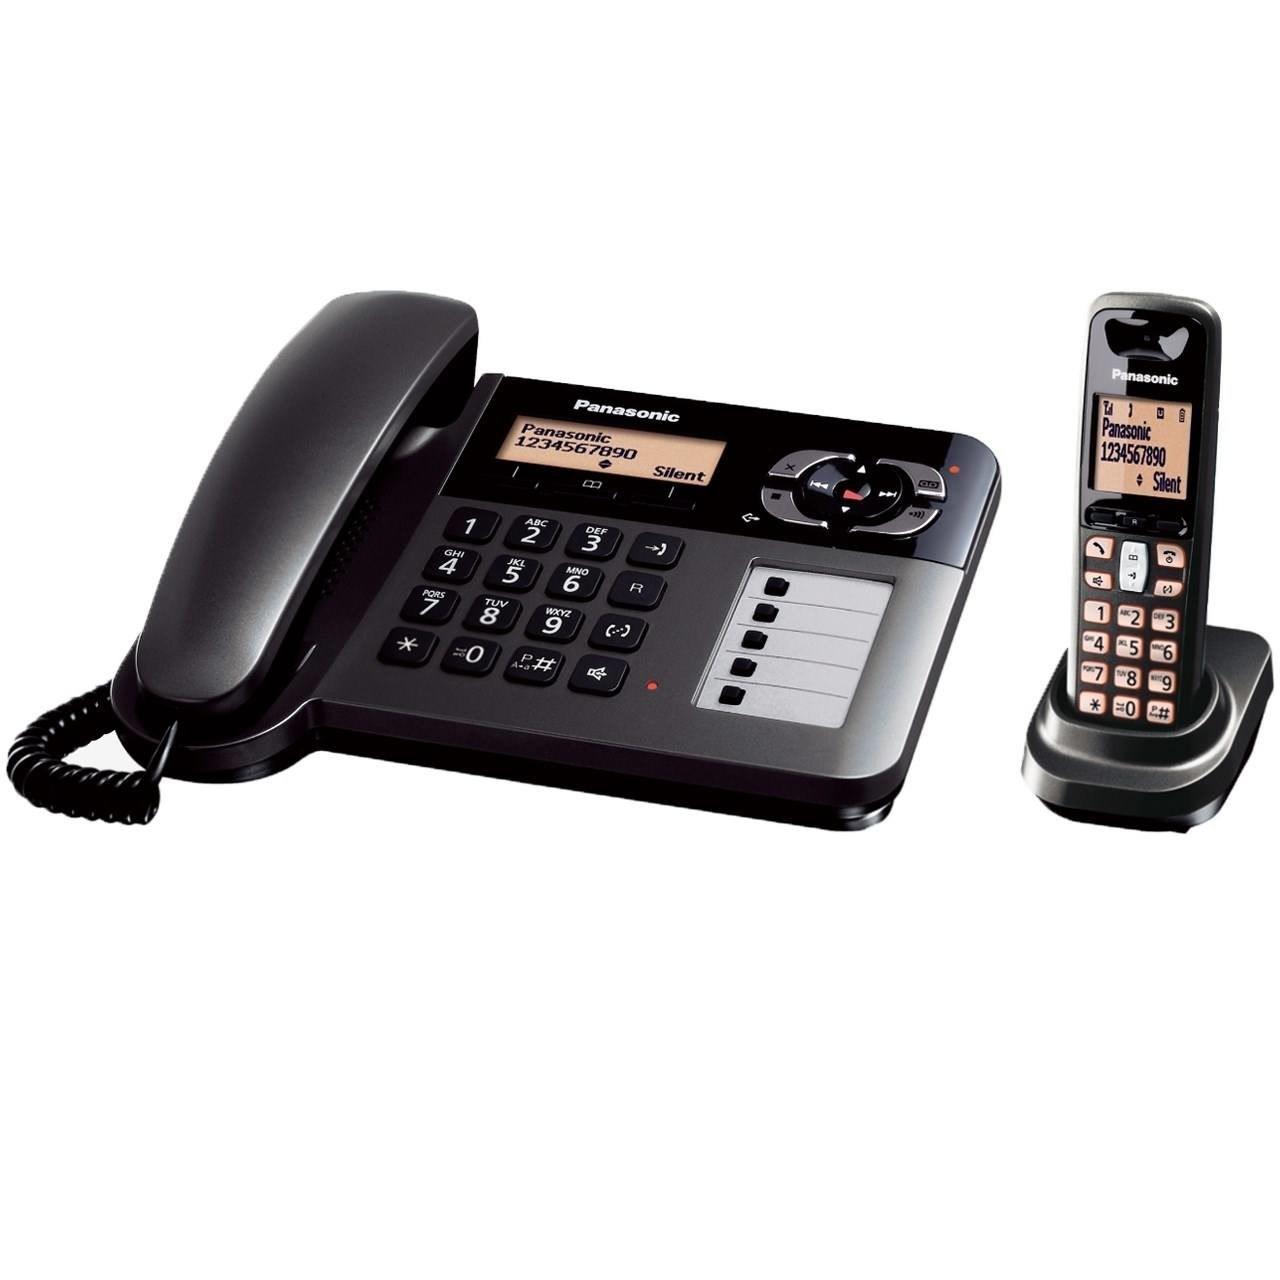 تصویر تلفن بی سیم پاناسونیک مدل KX-TGF120BX Panasonic Digital Cordless Phone - KX-TGF120BX